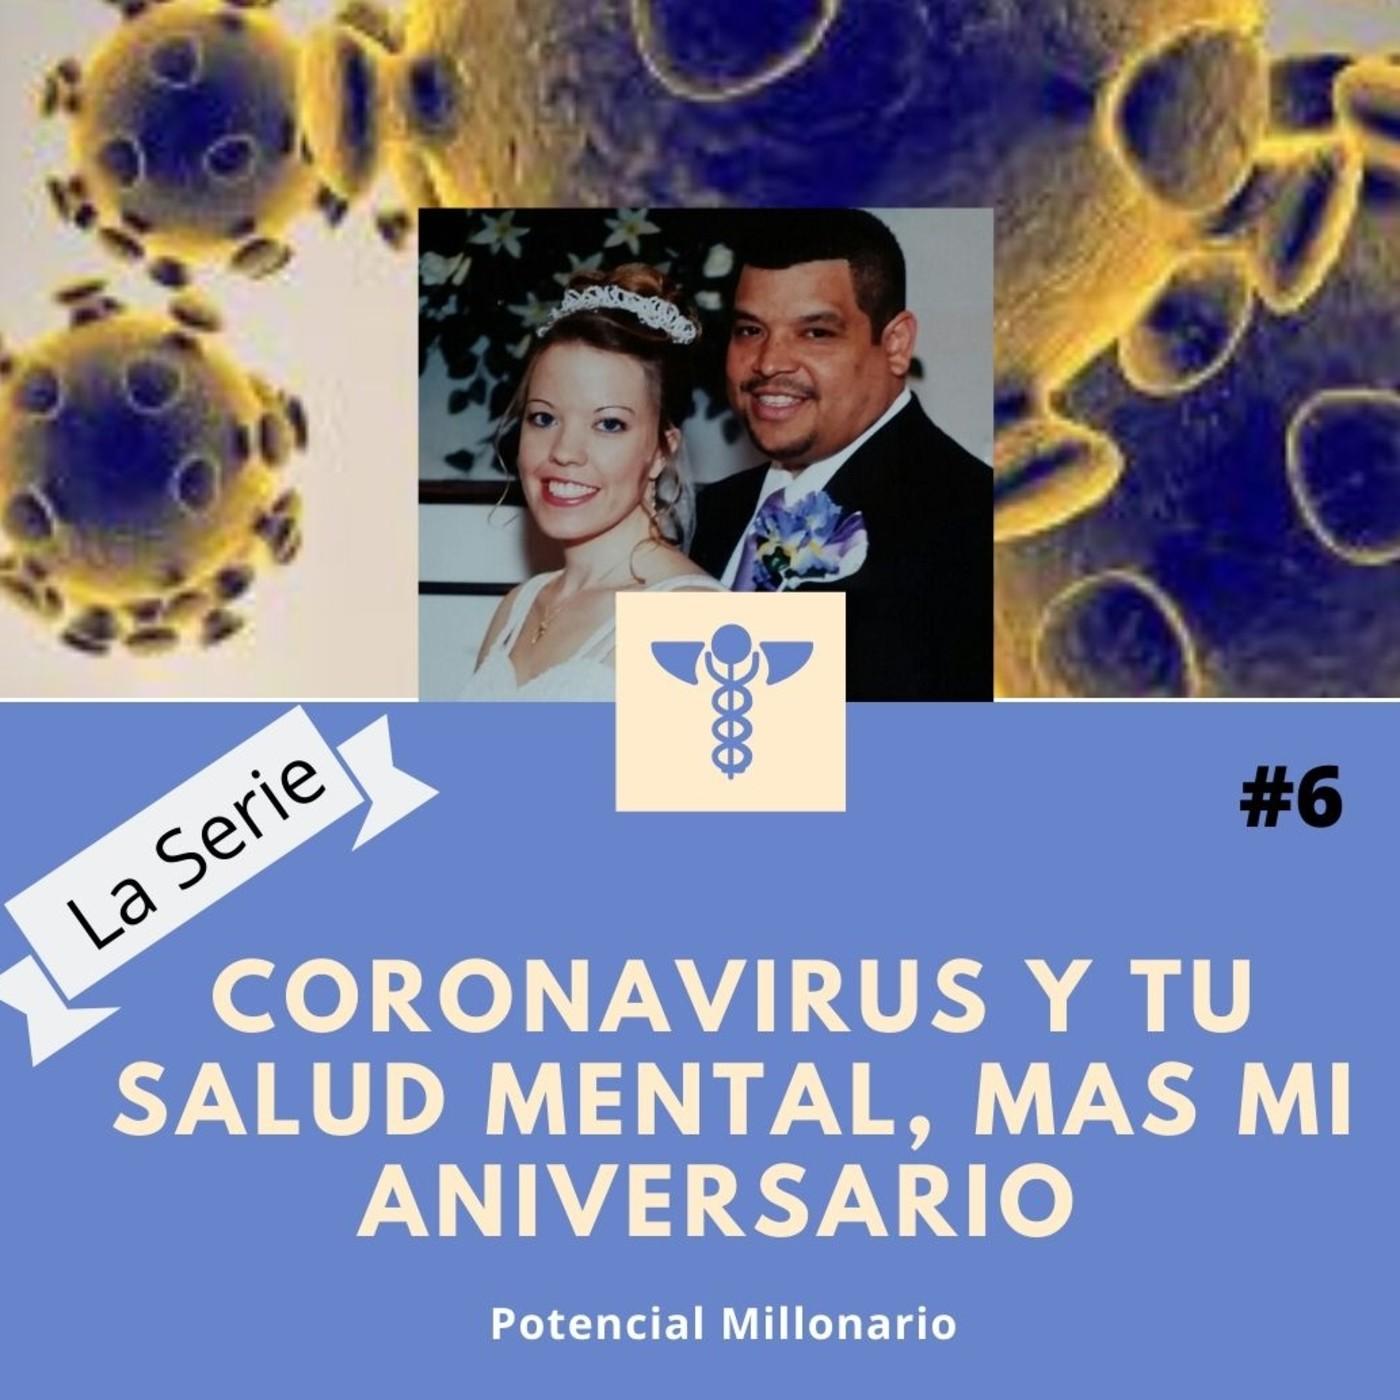 Coronavirus y tu Salud Mental mas mi aniversario